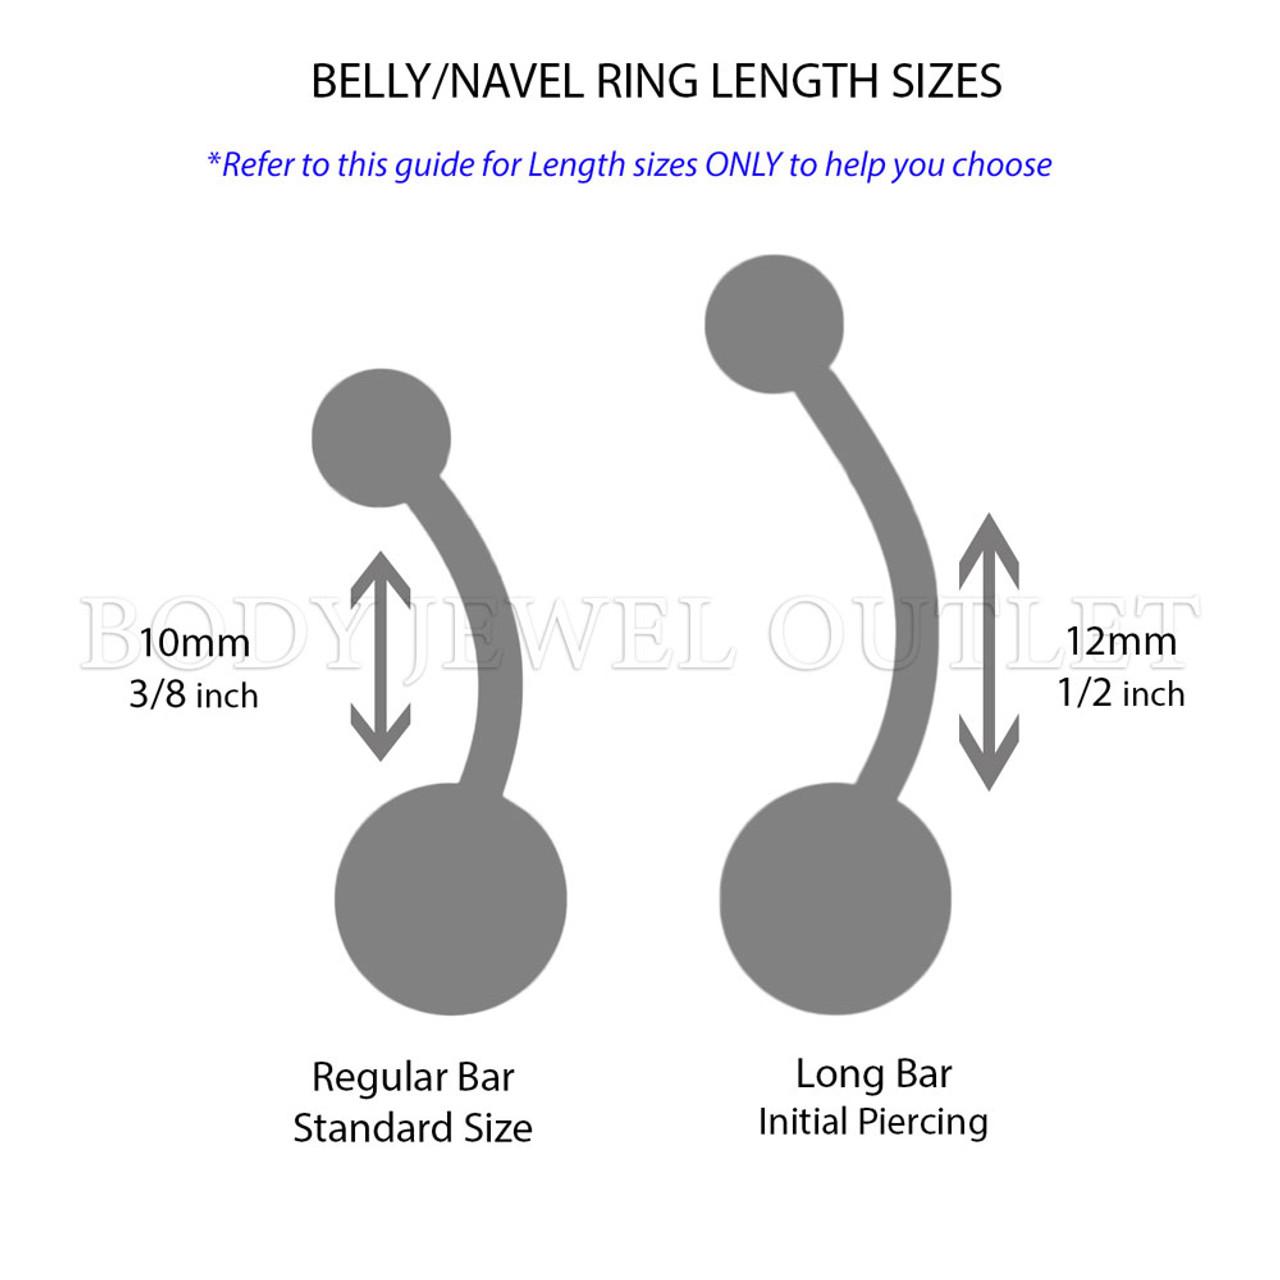 Orange GLOW in the Dark Acrylic Balls - Bio Flex Acrylic Belly/Navel Ring Piercing - 14 Gauge (1 Piece)